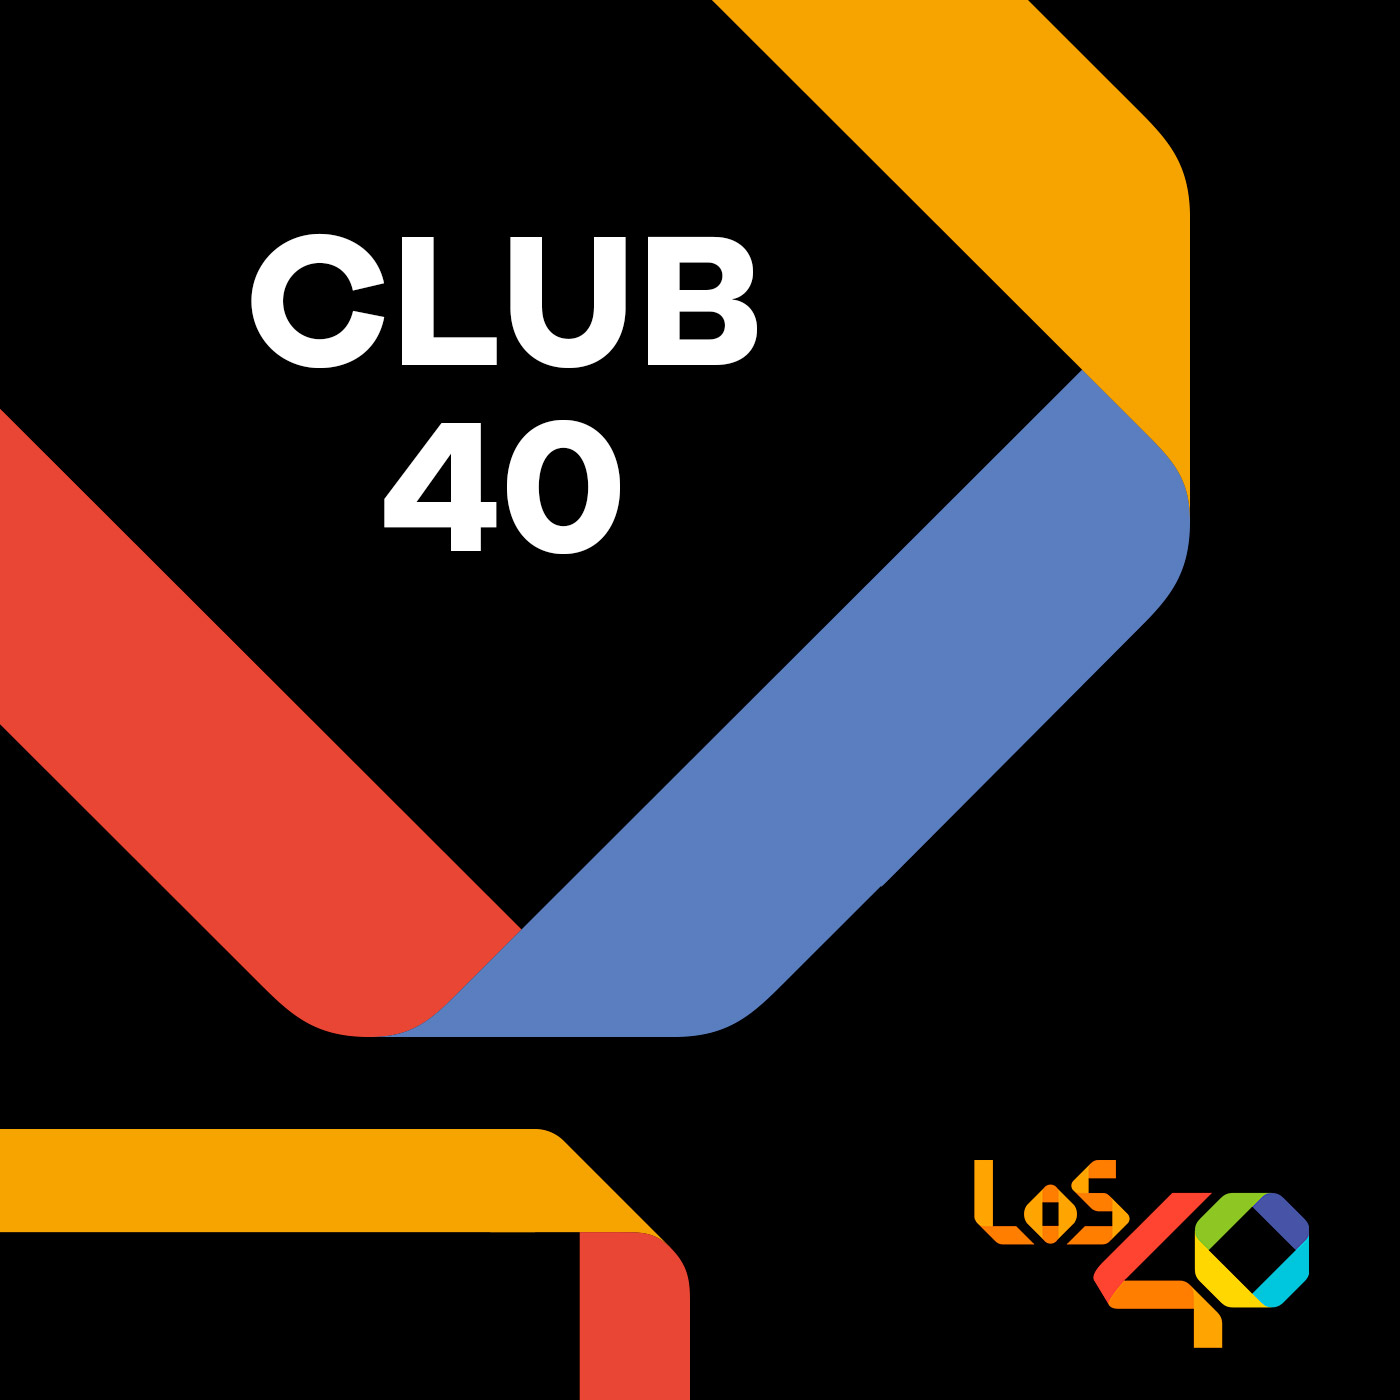 Club 40 (16/12/2017 - Tramo de 23:00 a 23:59)